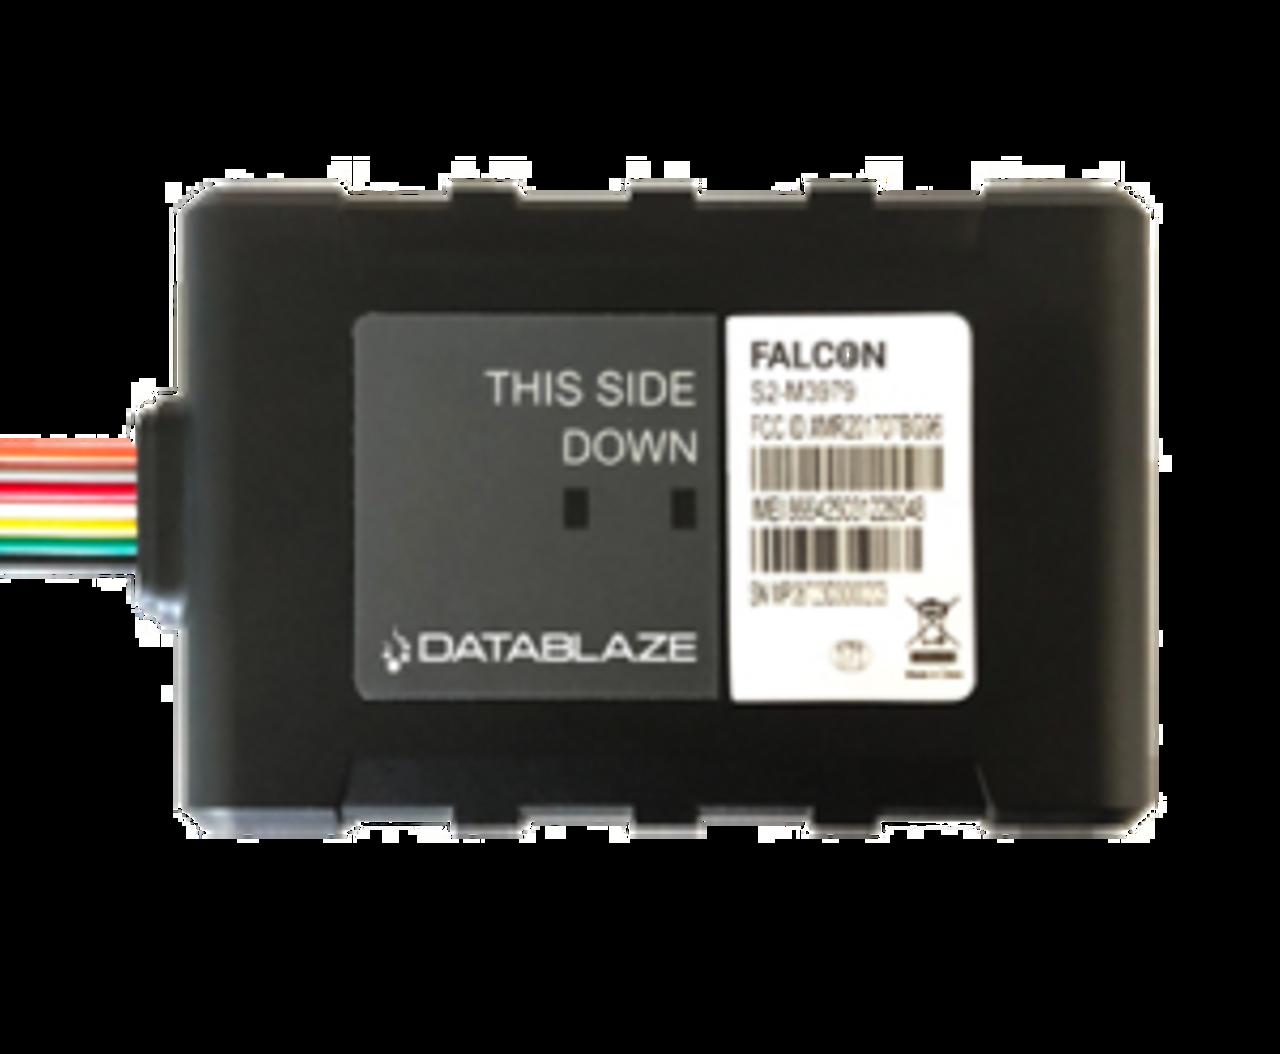 Falcon Hardwired GPS Tracker